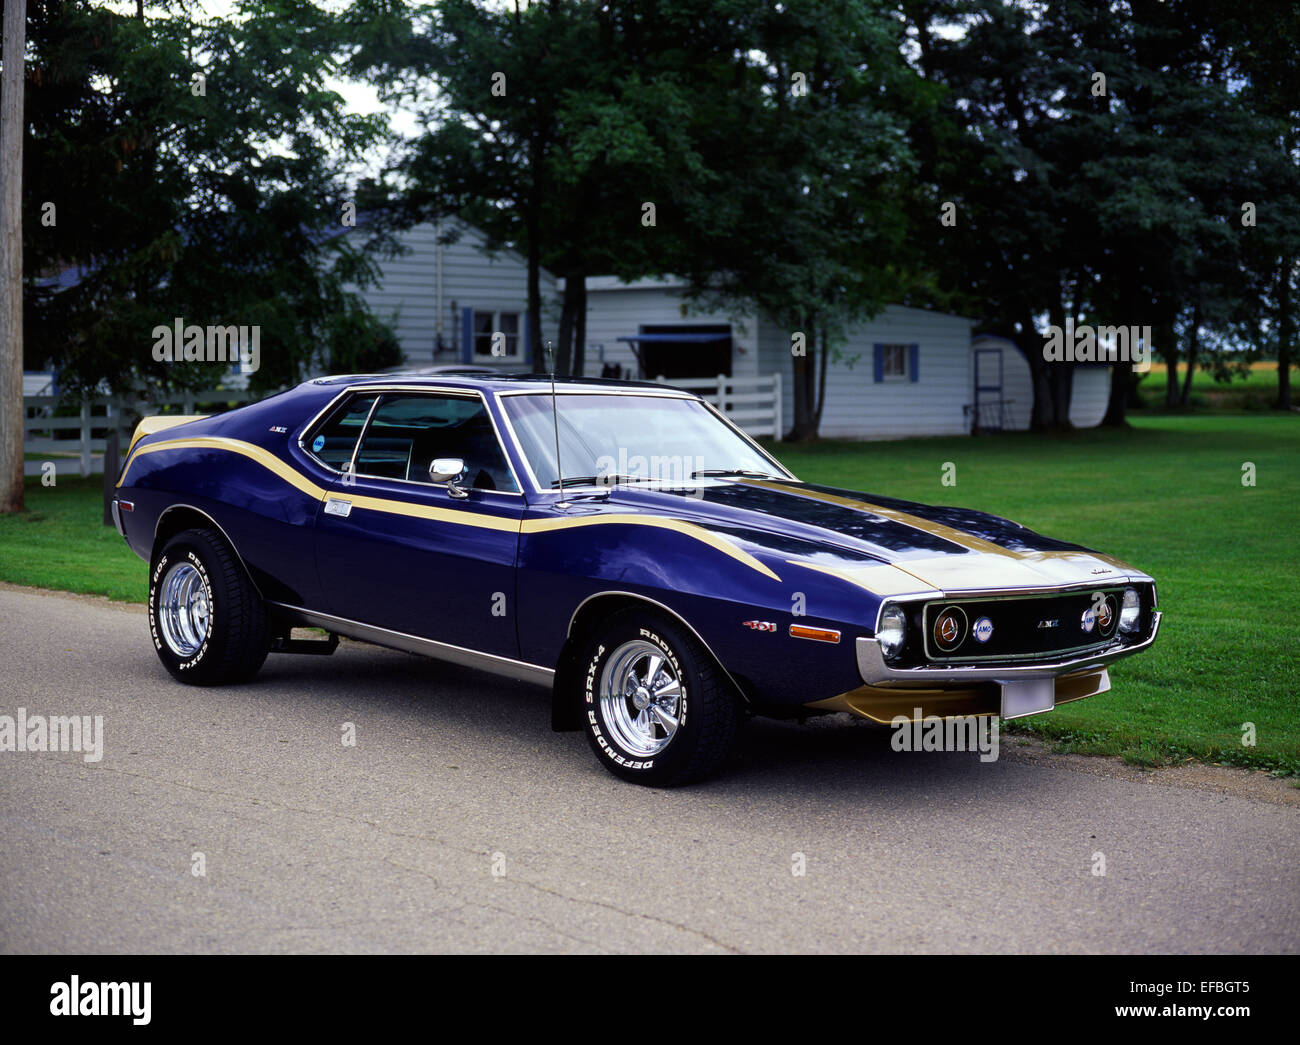 1973 American Motor Company Amc Javelin Amx Stock Photo